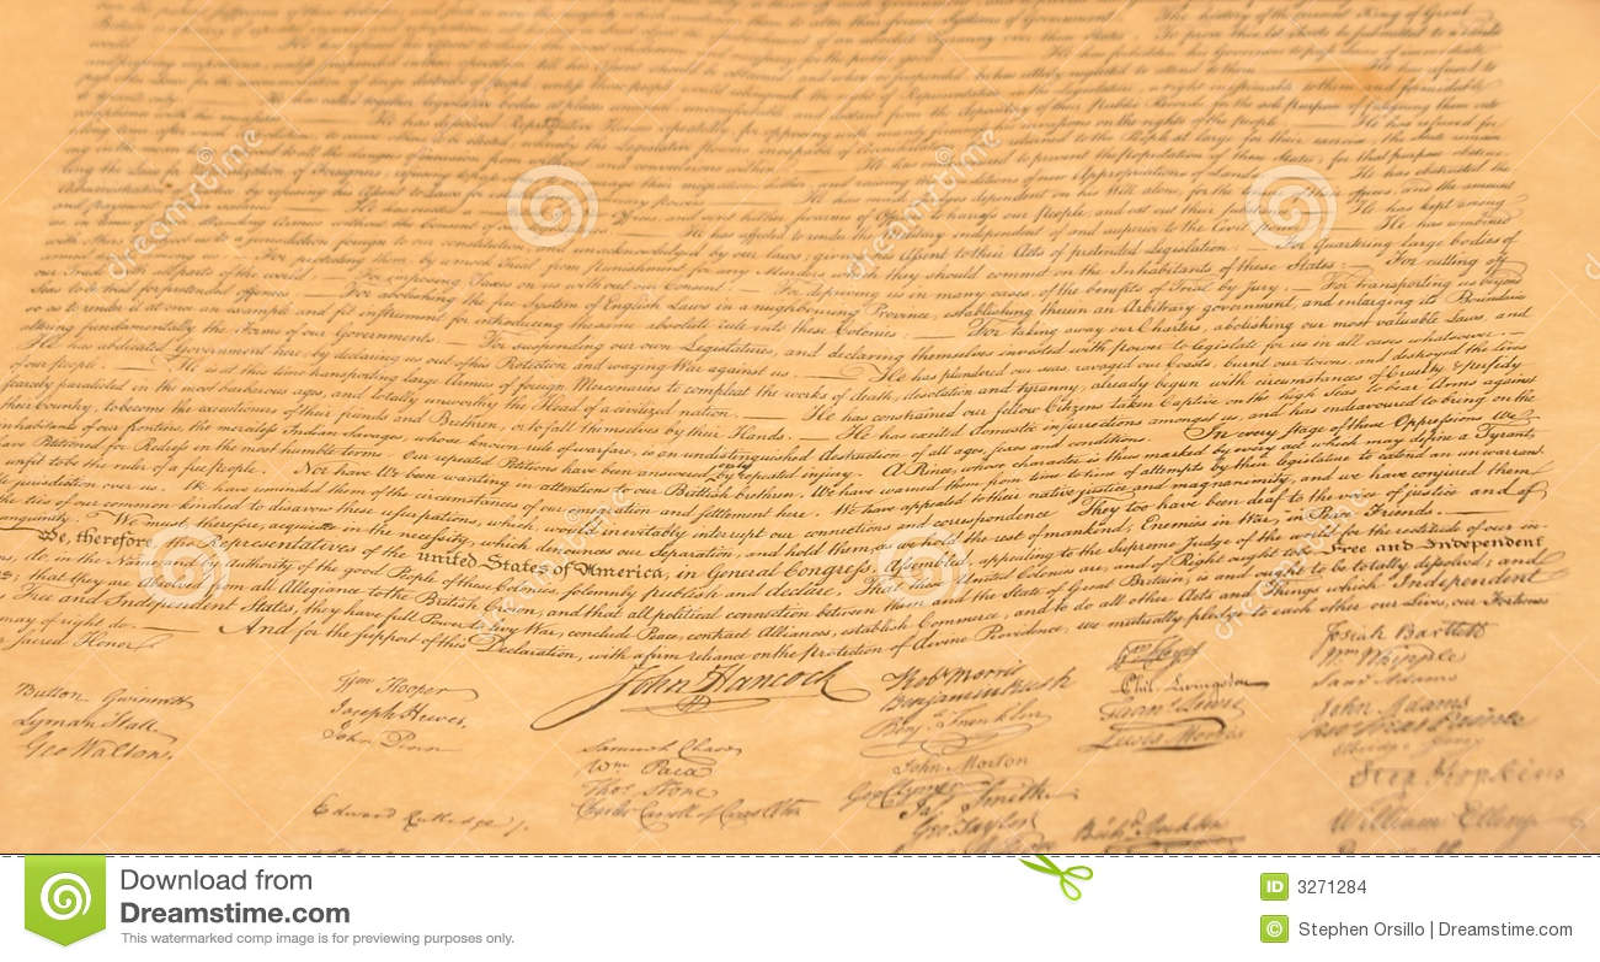 Declaration Background Stock Images - Image: 3271284